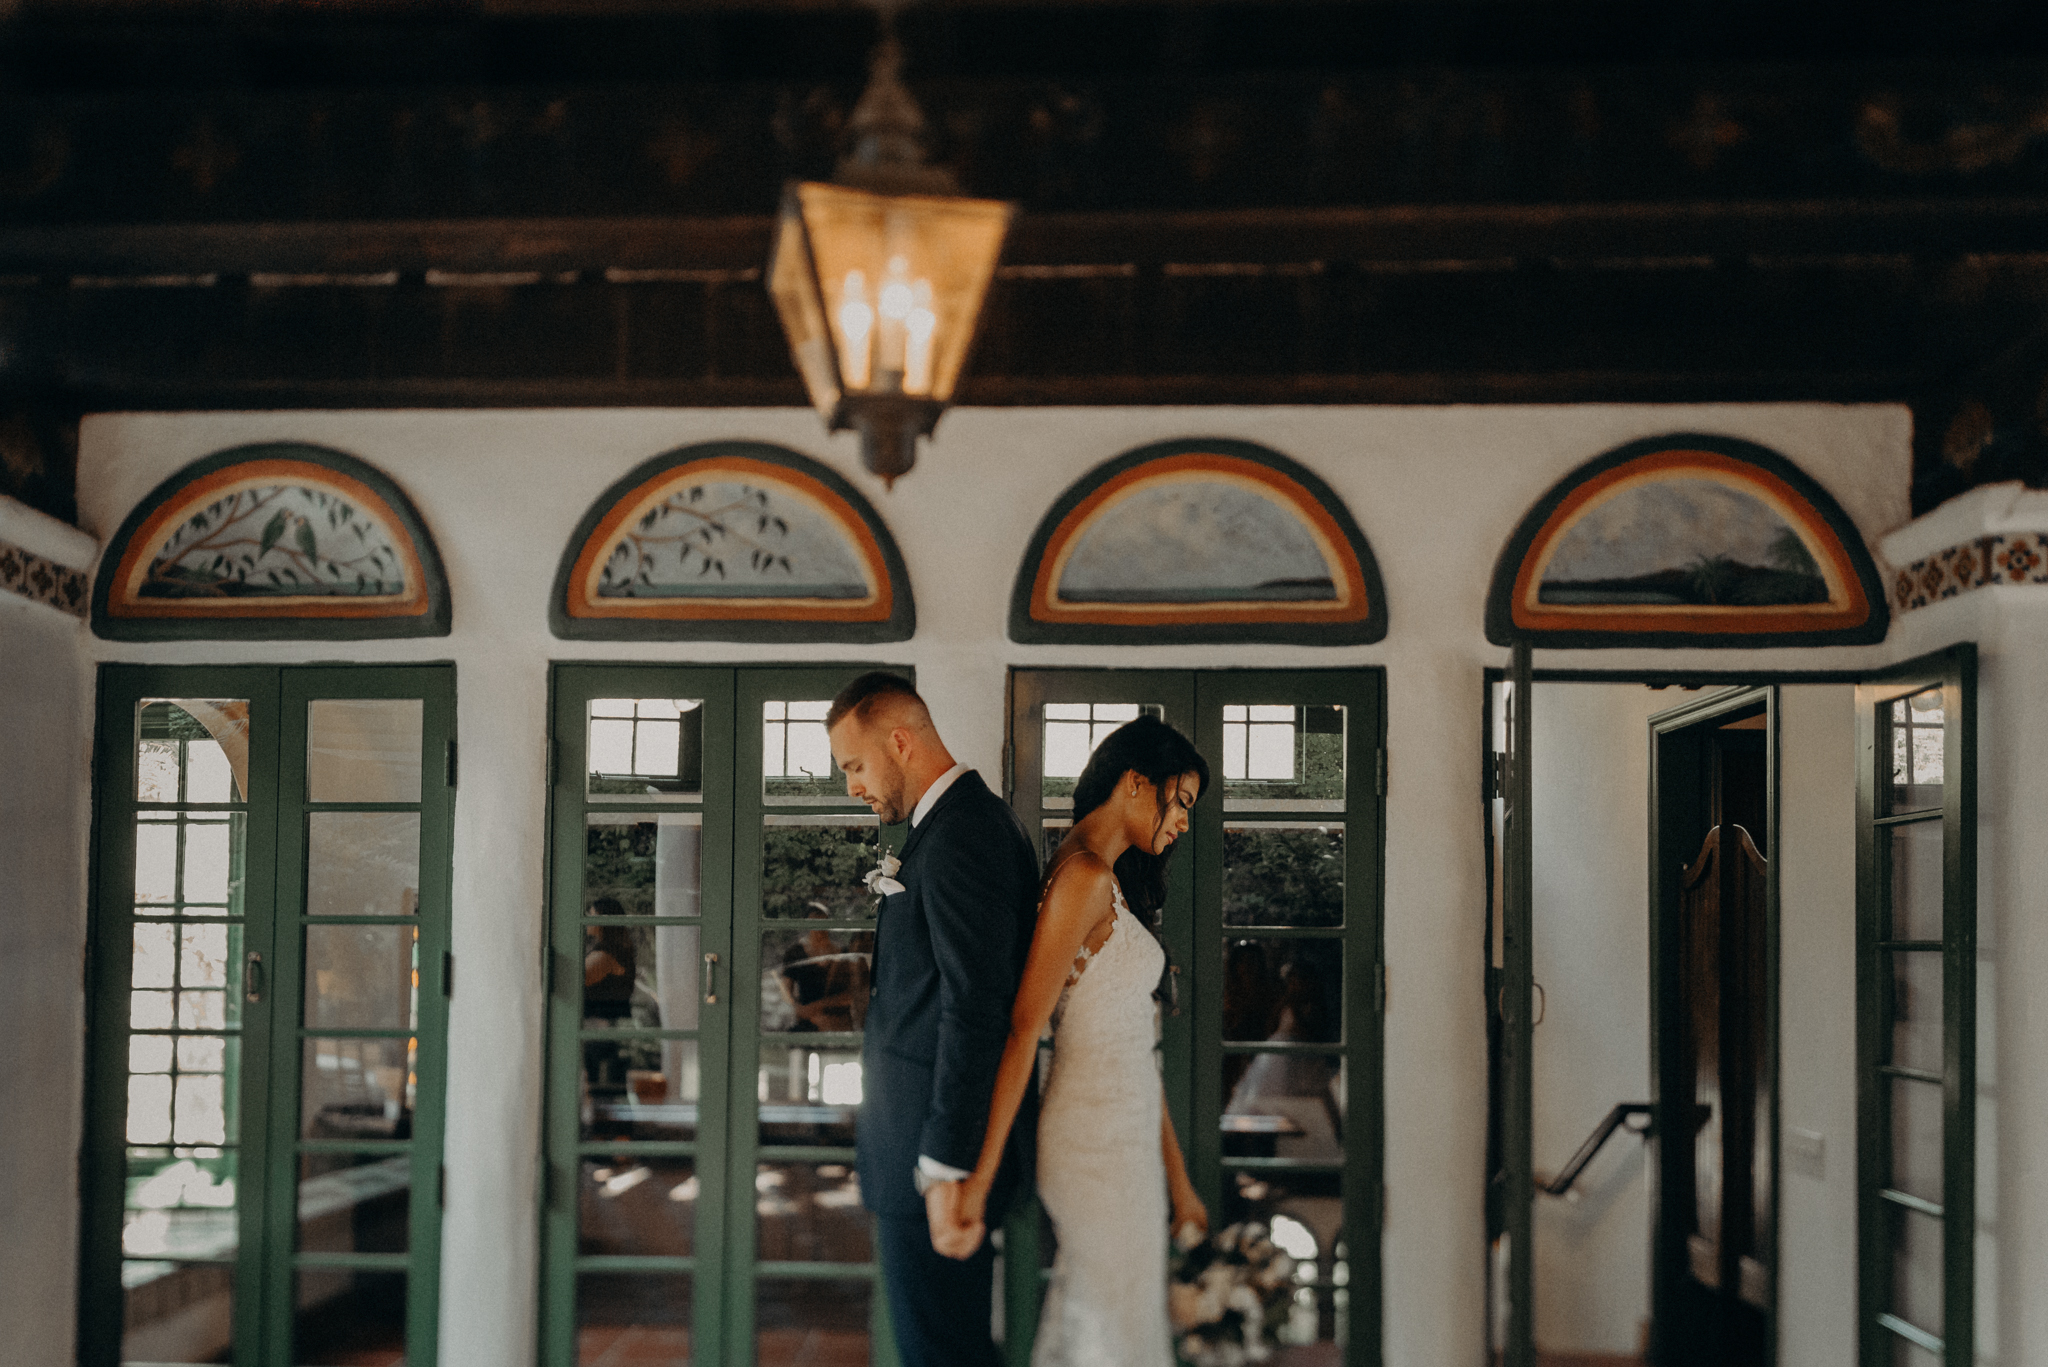 Isaiah + Taylor Photography - Rancho Las Lomas Wedding, Los Angeles Wedding Photographer-034.jpg